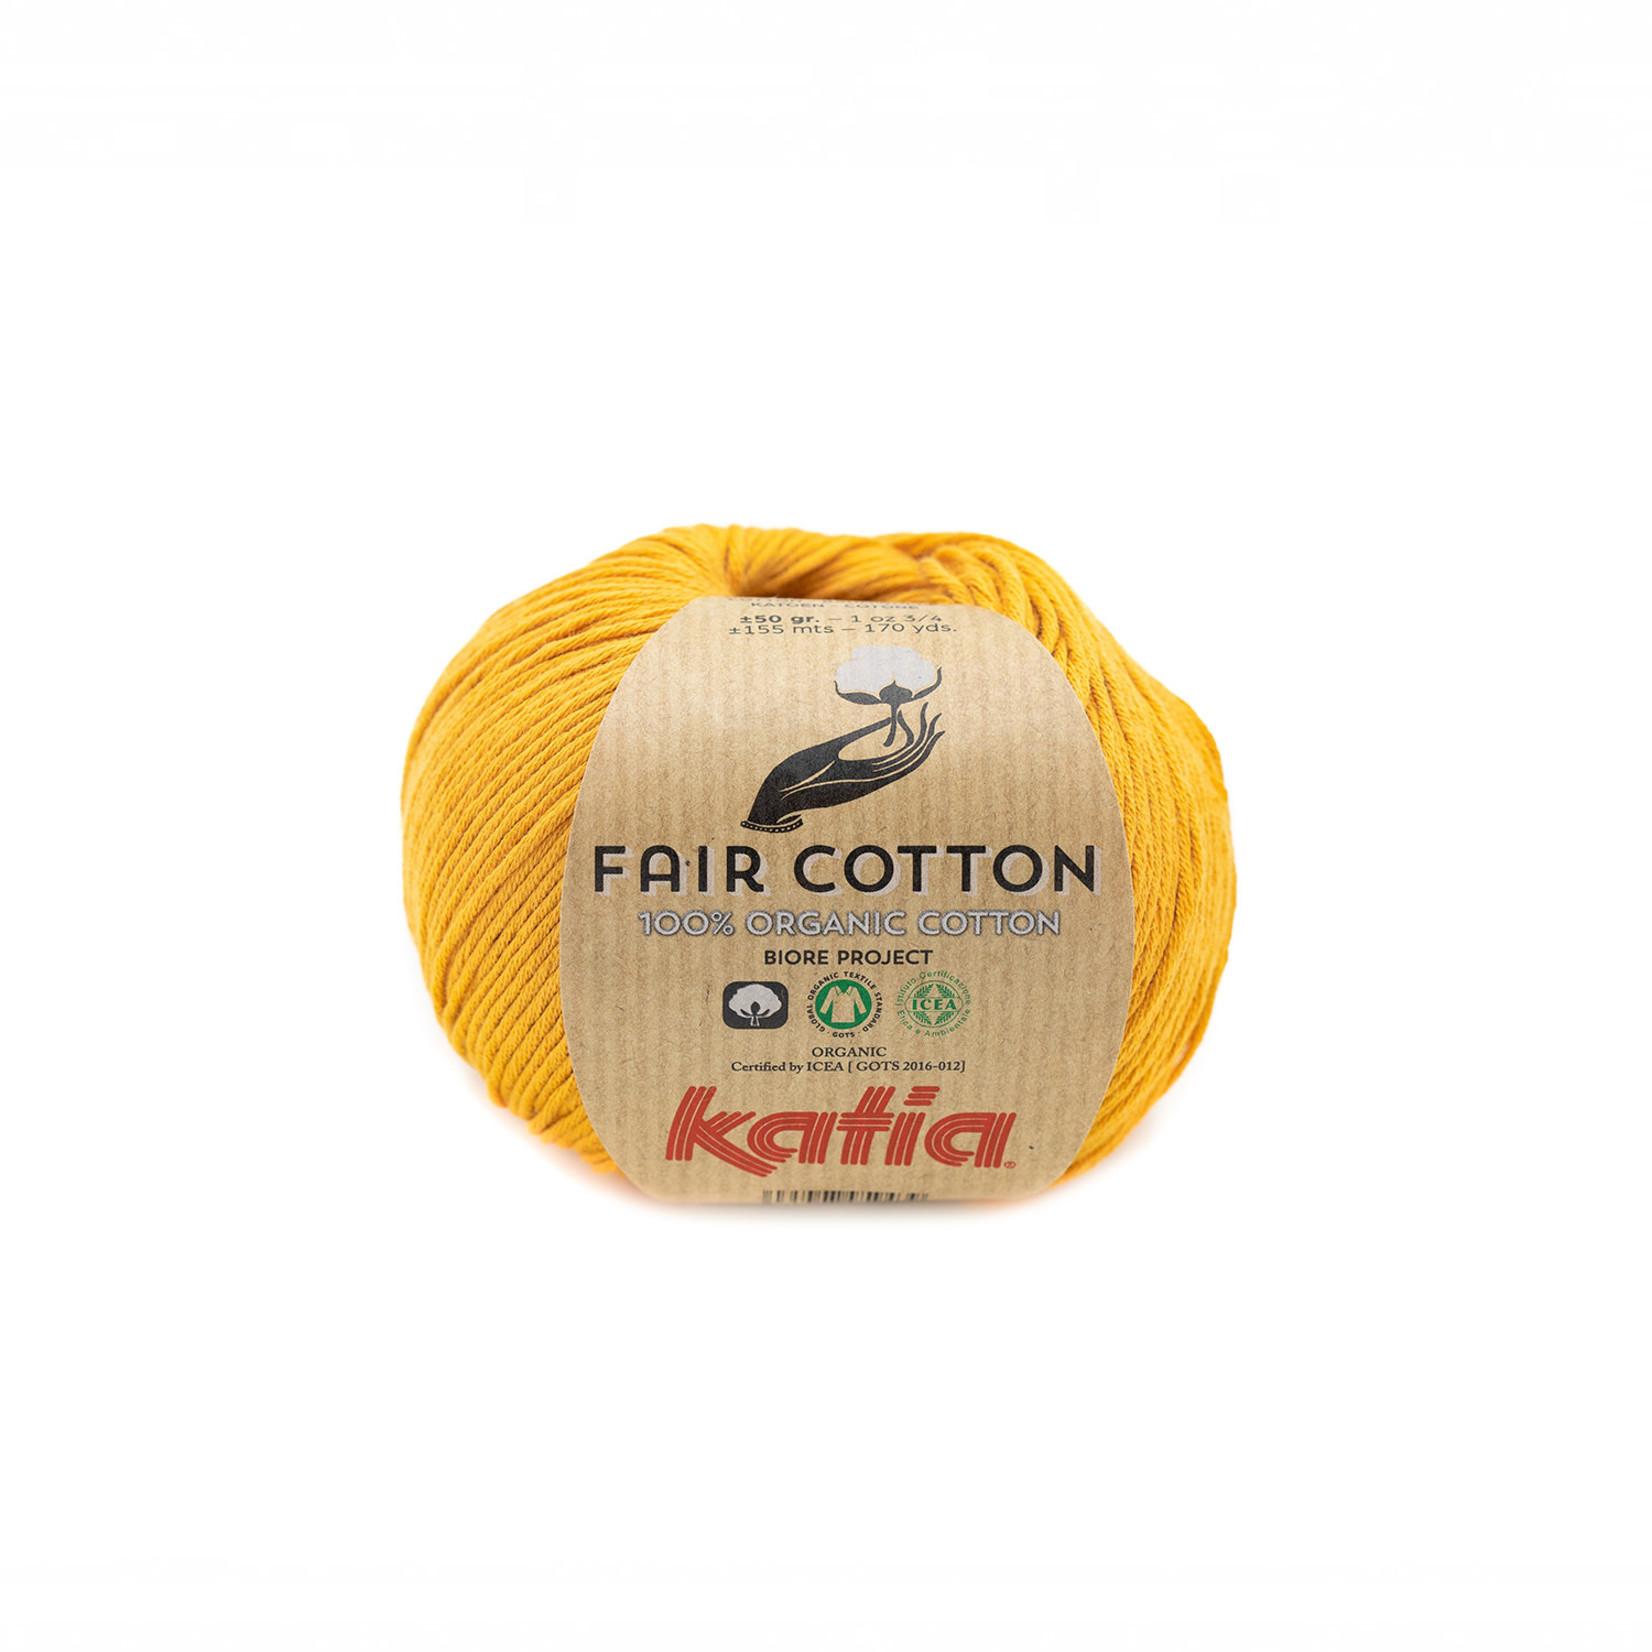 Katia Katia Fair Cotton 37 - mosterdgeel - 1 bol = 50 gr. = 155 m. - 100% biol. katoen